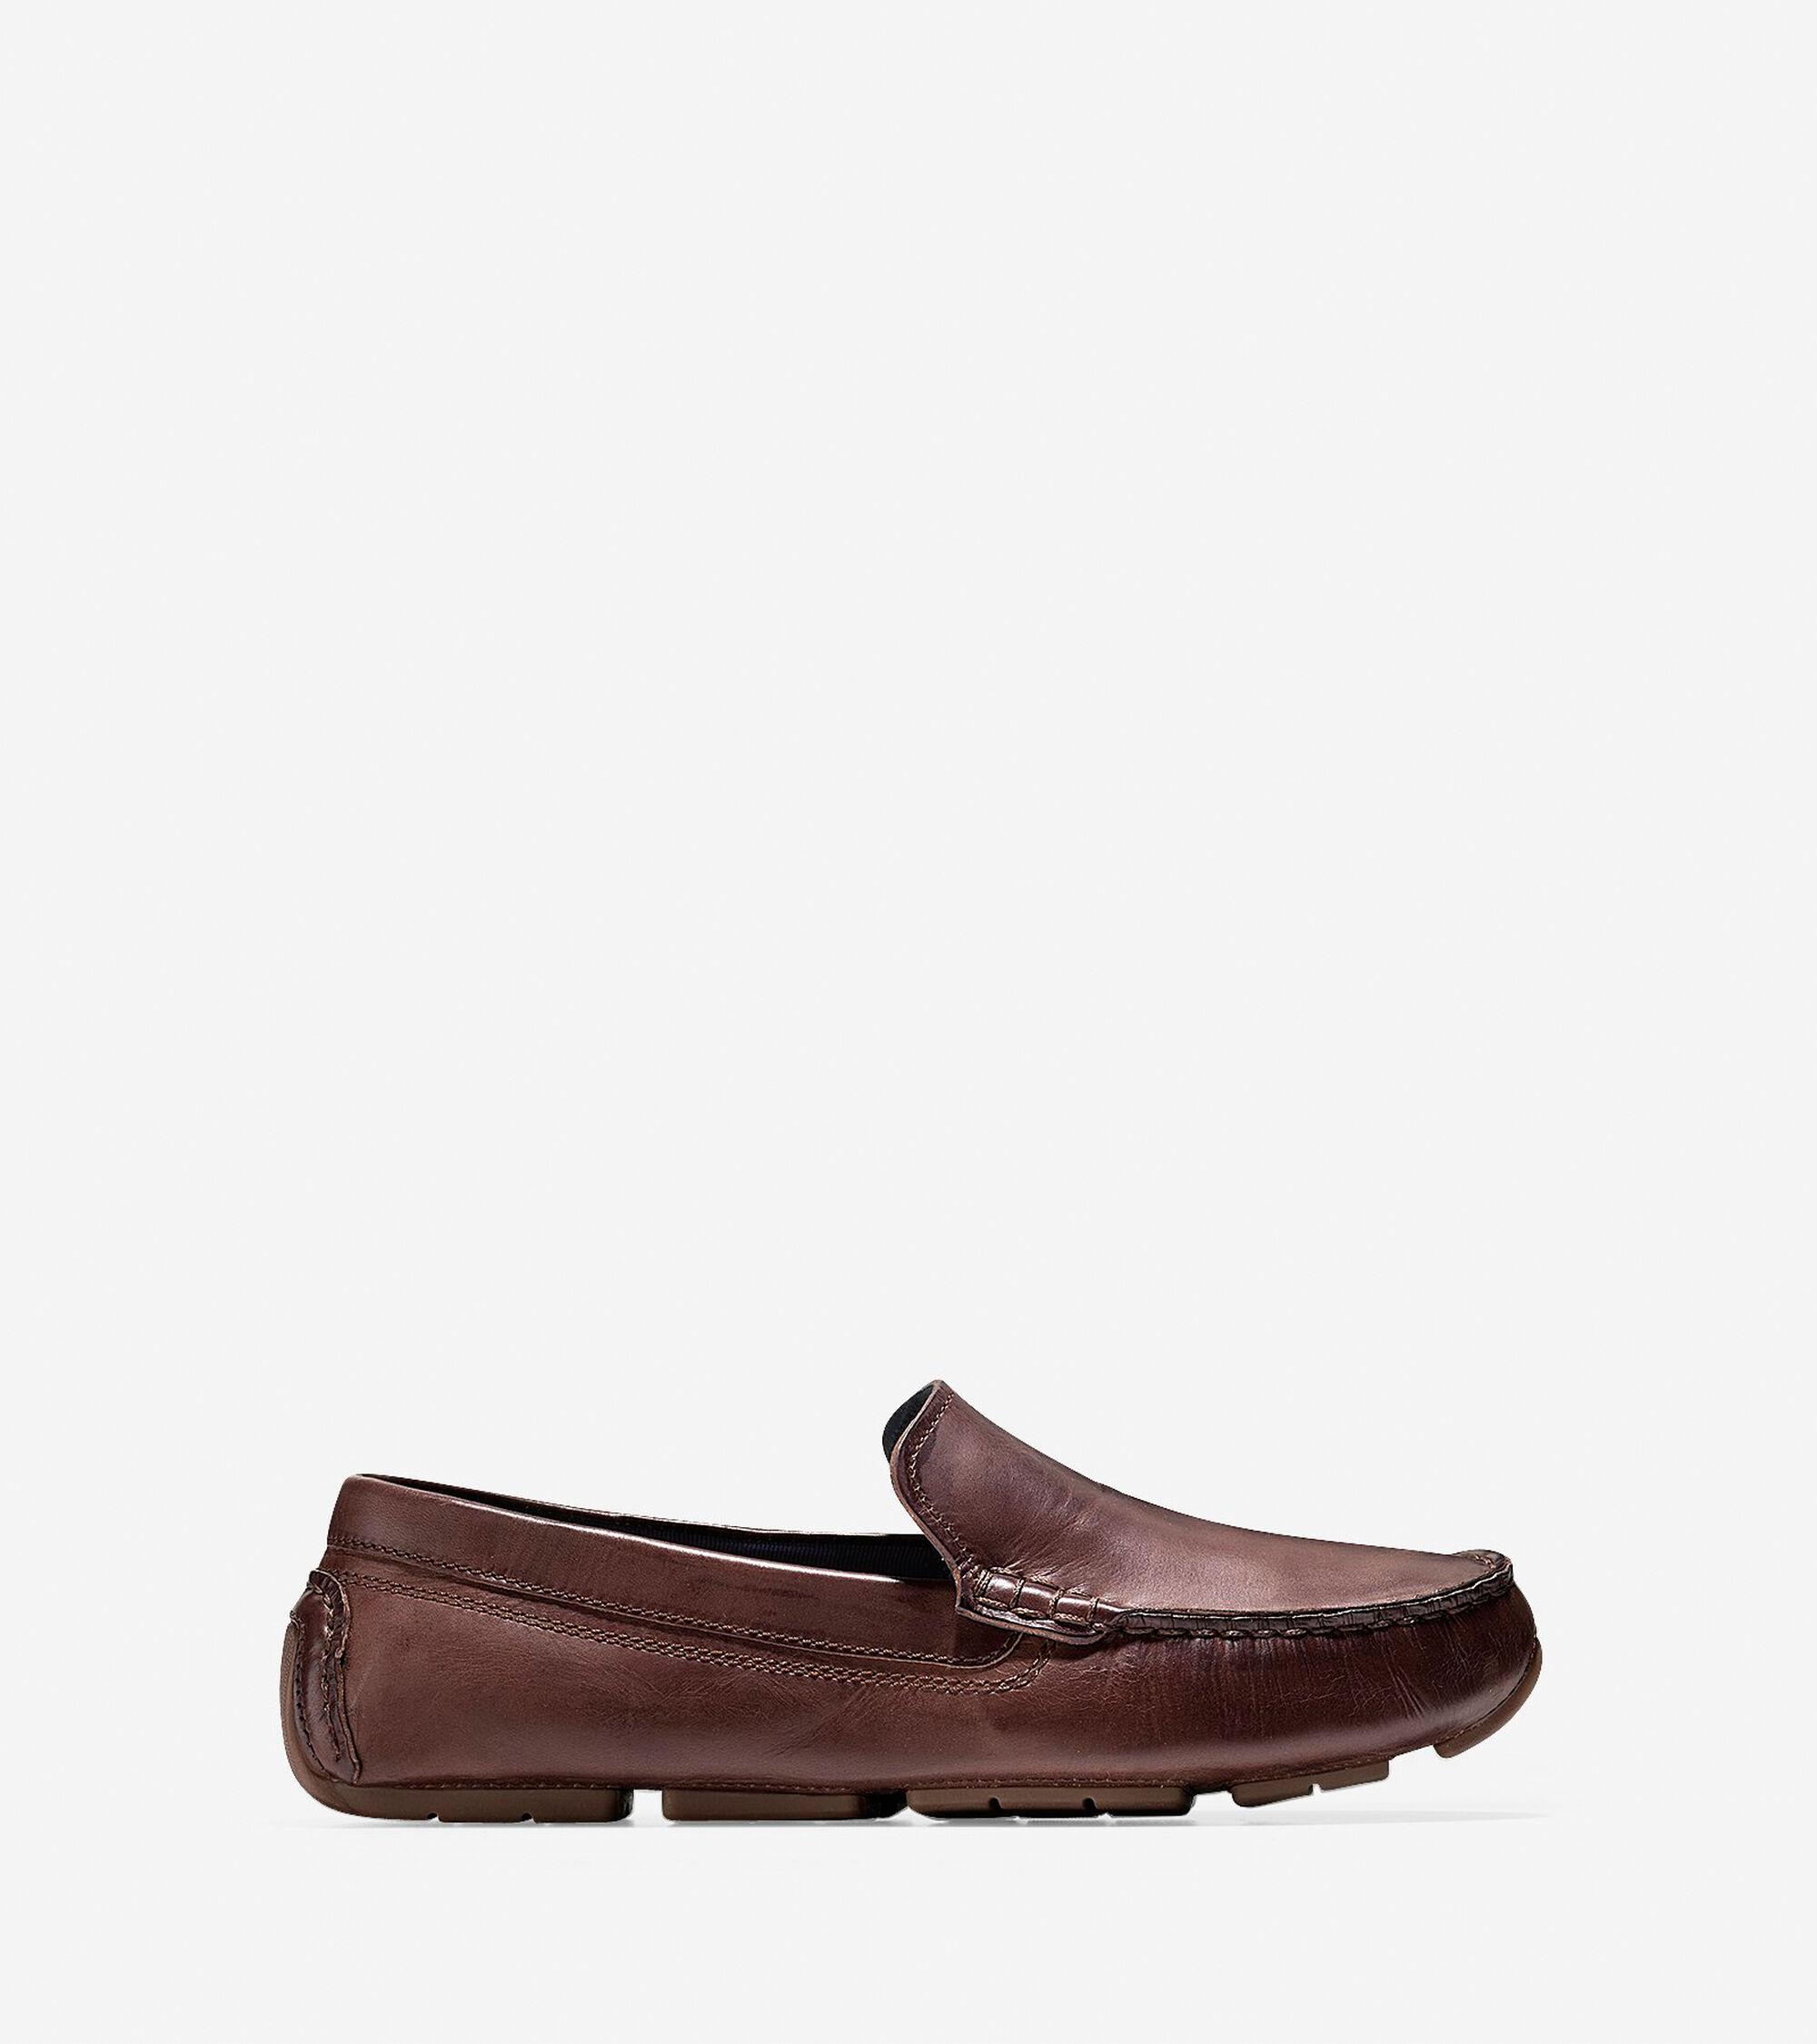 8e9ef7cf068 Mens Kelson Venetian Loafers in British Tan